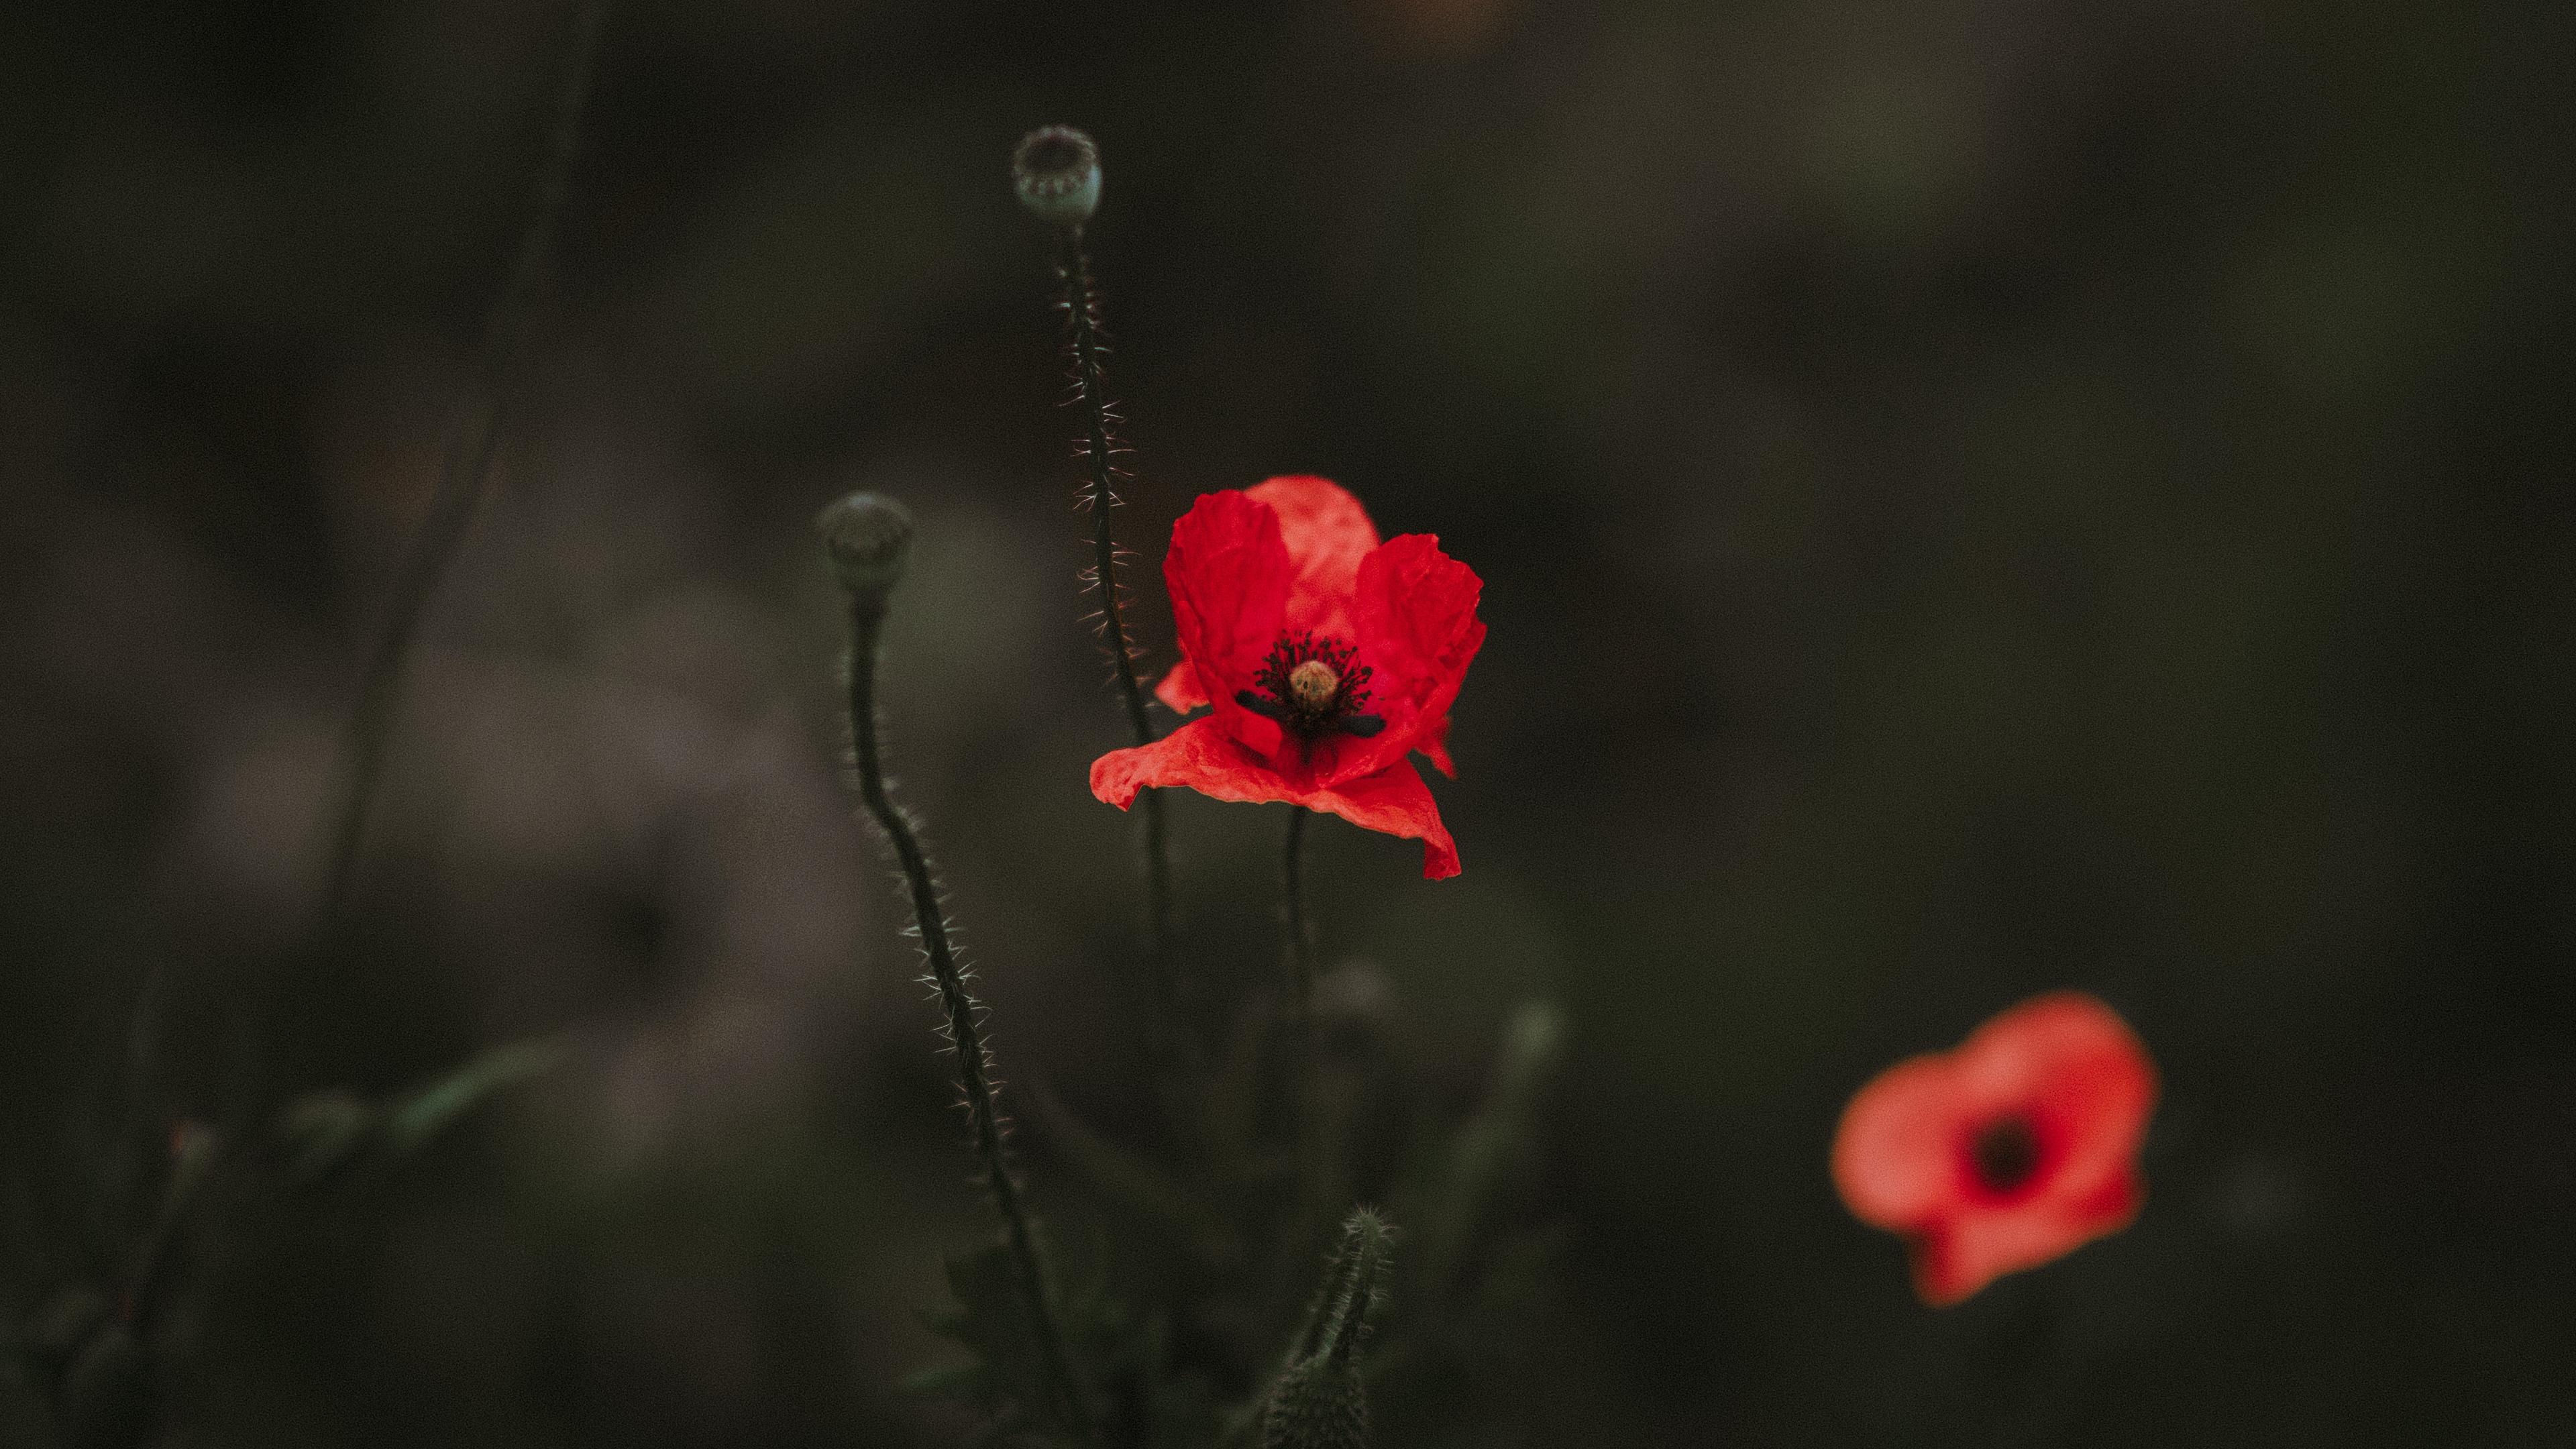 poppy red blur bloom flowerbed 4k 1540064495 - poppy, red, blur, bloom, flowerbed 4k - red, Poppy, Blur